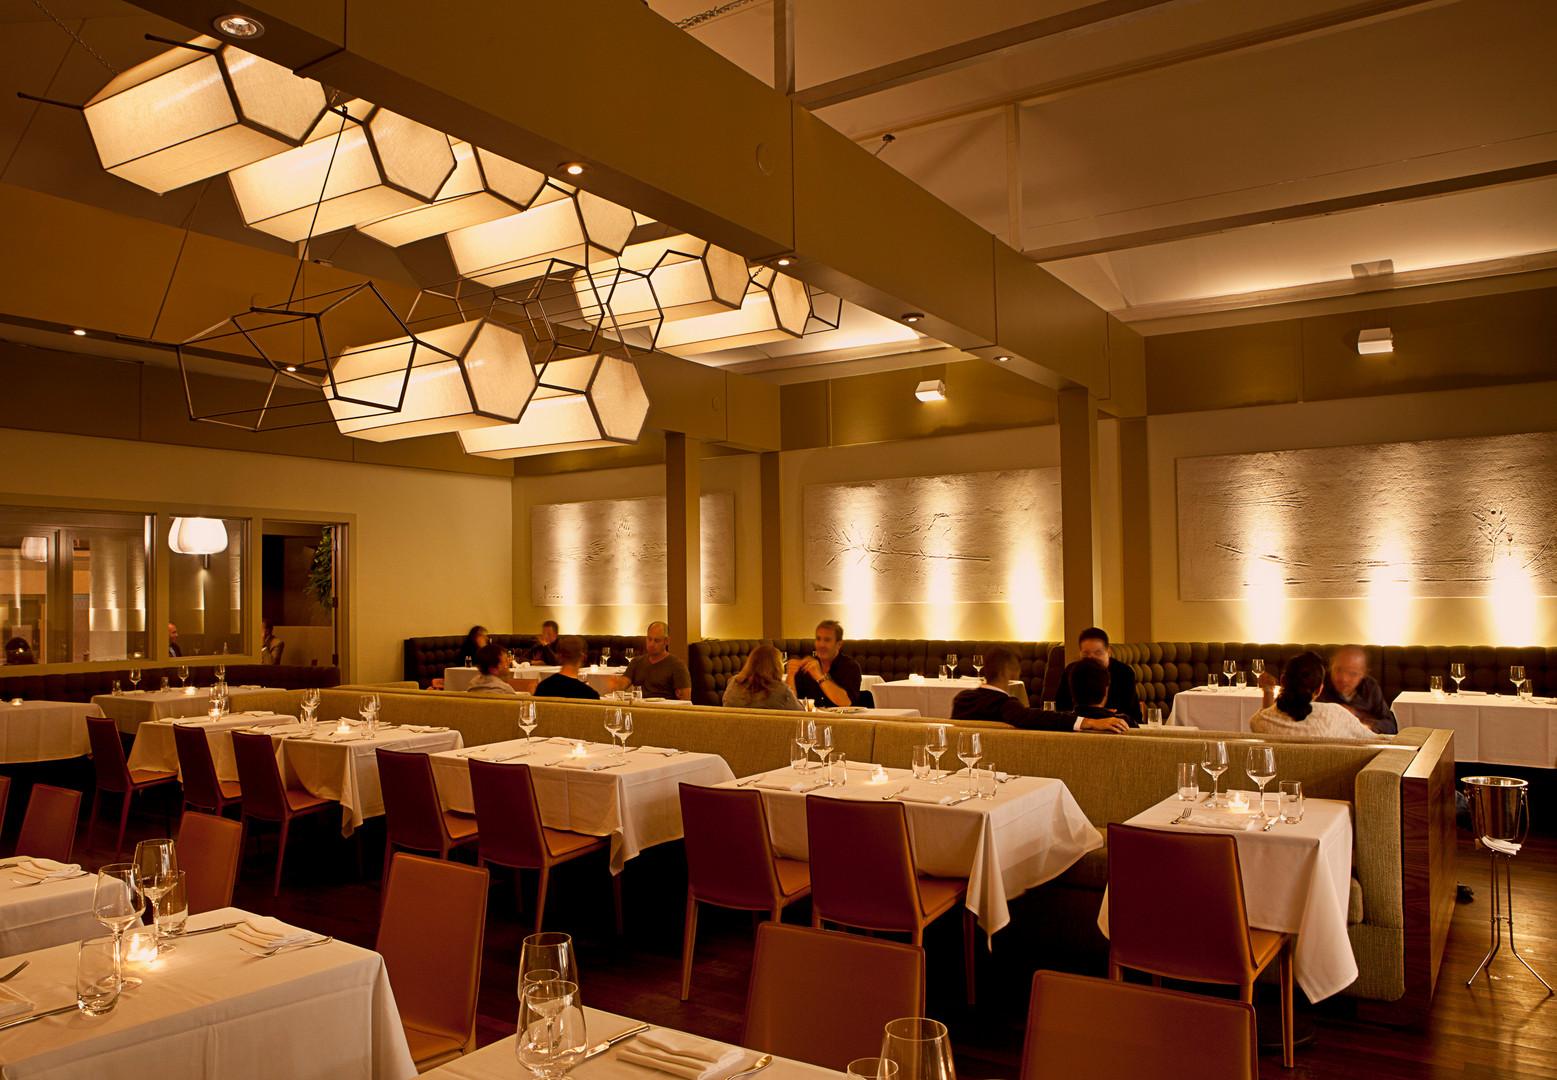 3 z dining room scene facing panels.jpg